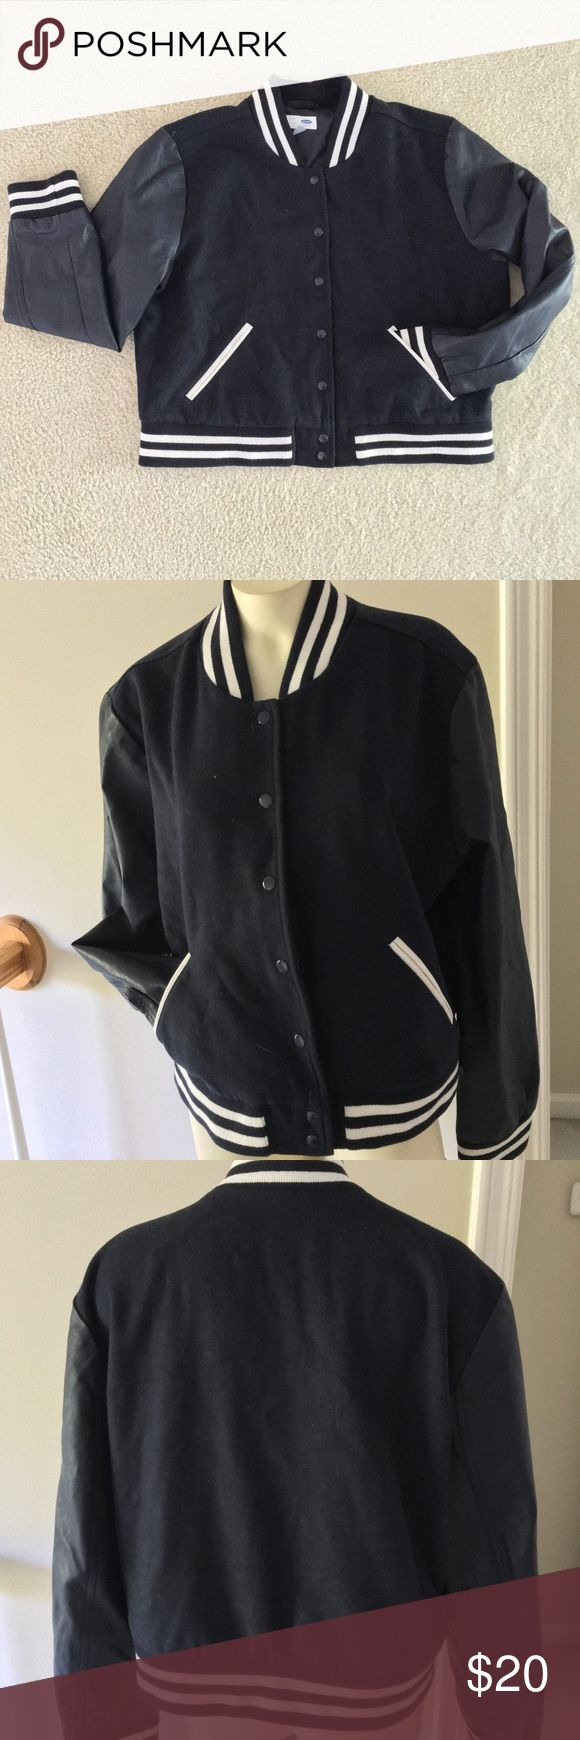 Selling this Varsity Letterman Jacket🍂 on Poshmark! My username is: thisbrightstar. #shopmycloset #poshmark #fashion #shopping #style #forsale #Old Navy #Jackets & Blazers